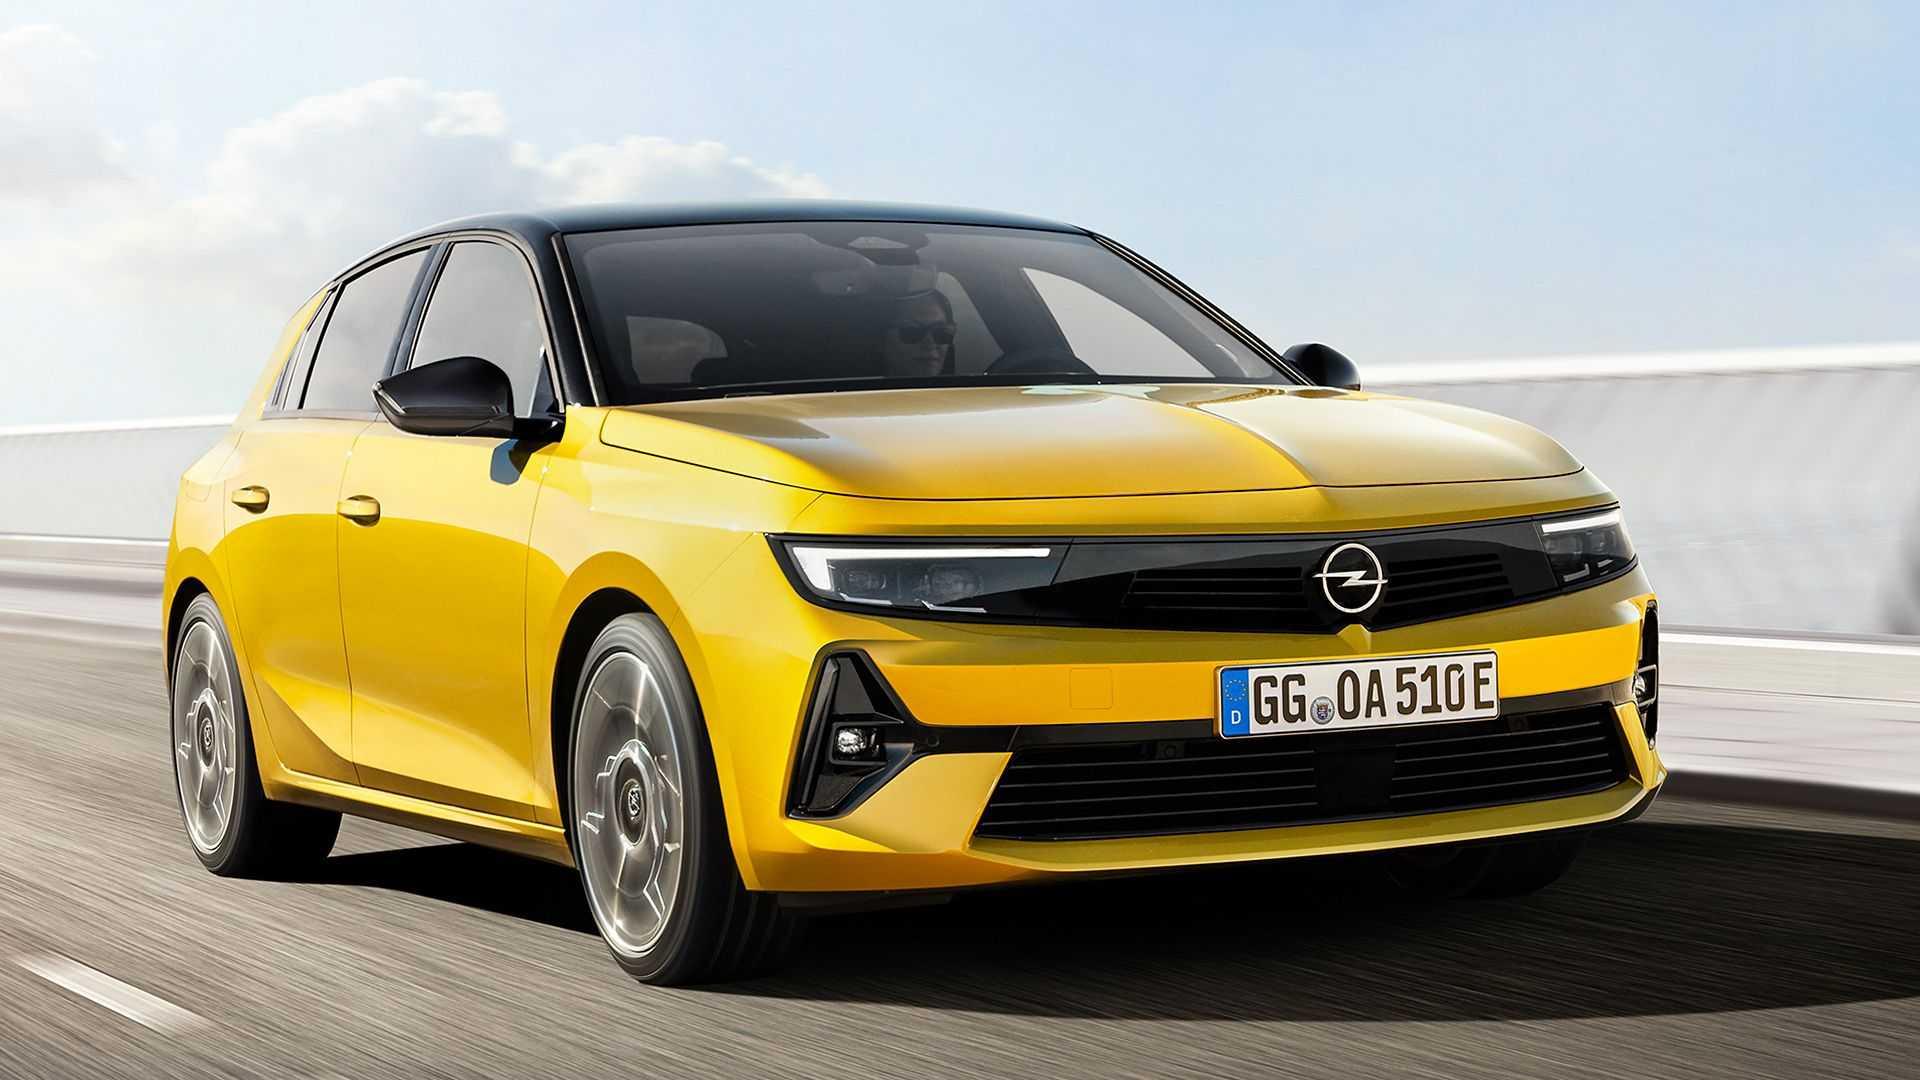 Nuova Opel Astra 2021, interni, motori, plug-in, tecnologia